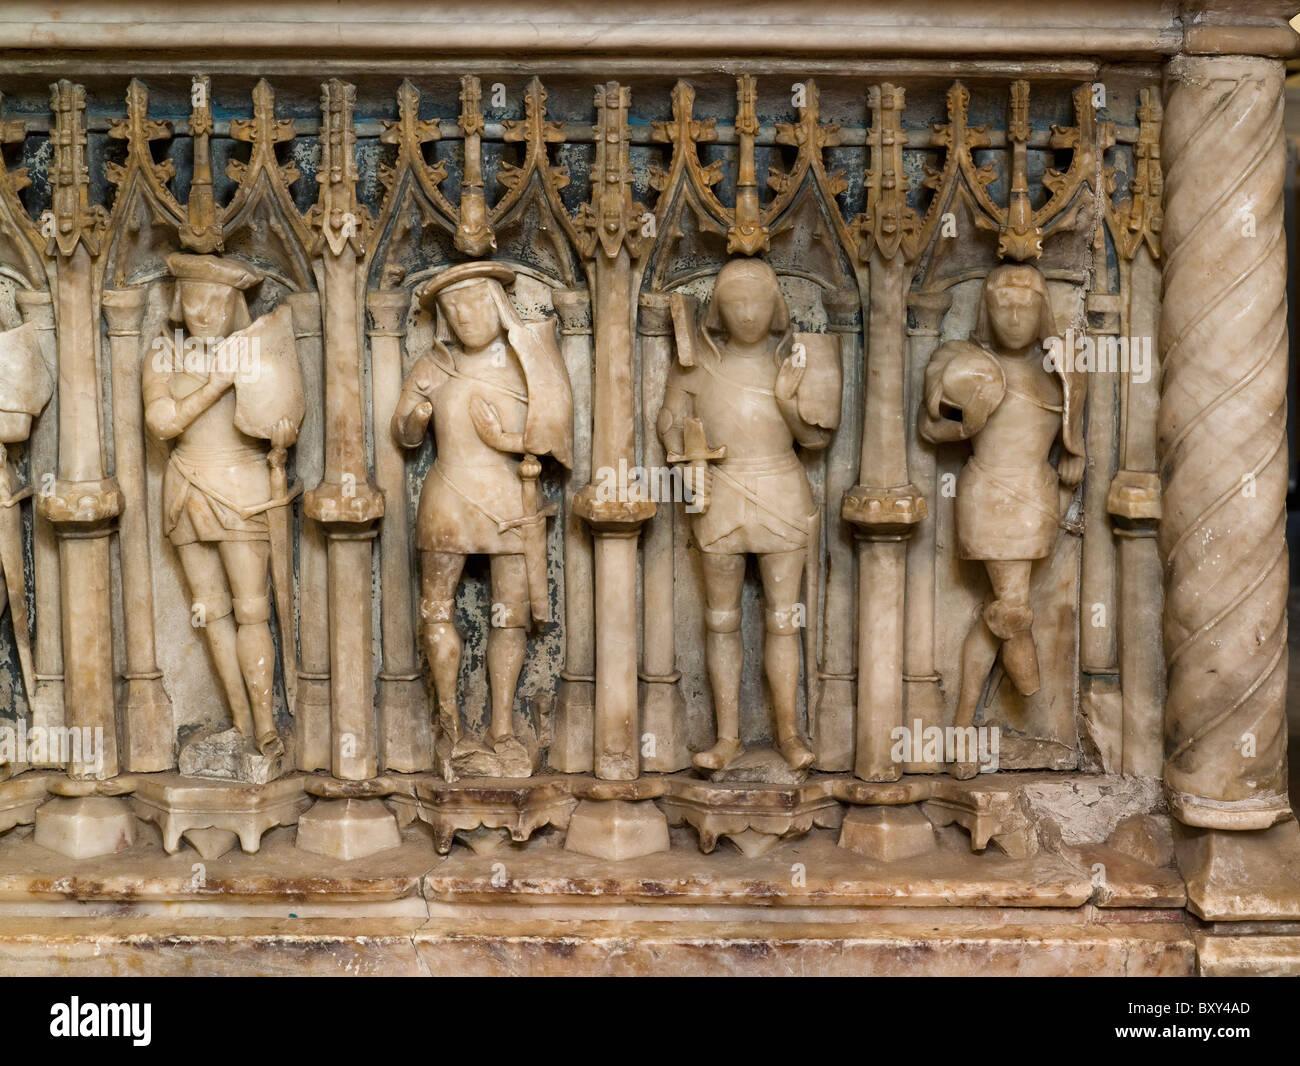 St Mary, Aldermaston, Forster tomb - Stock Image